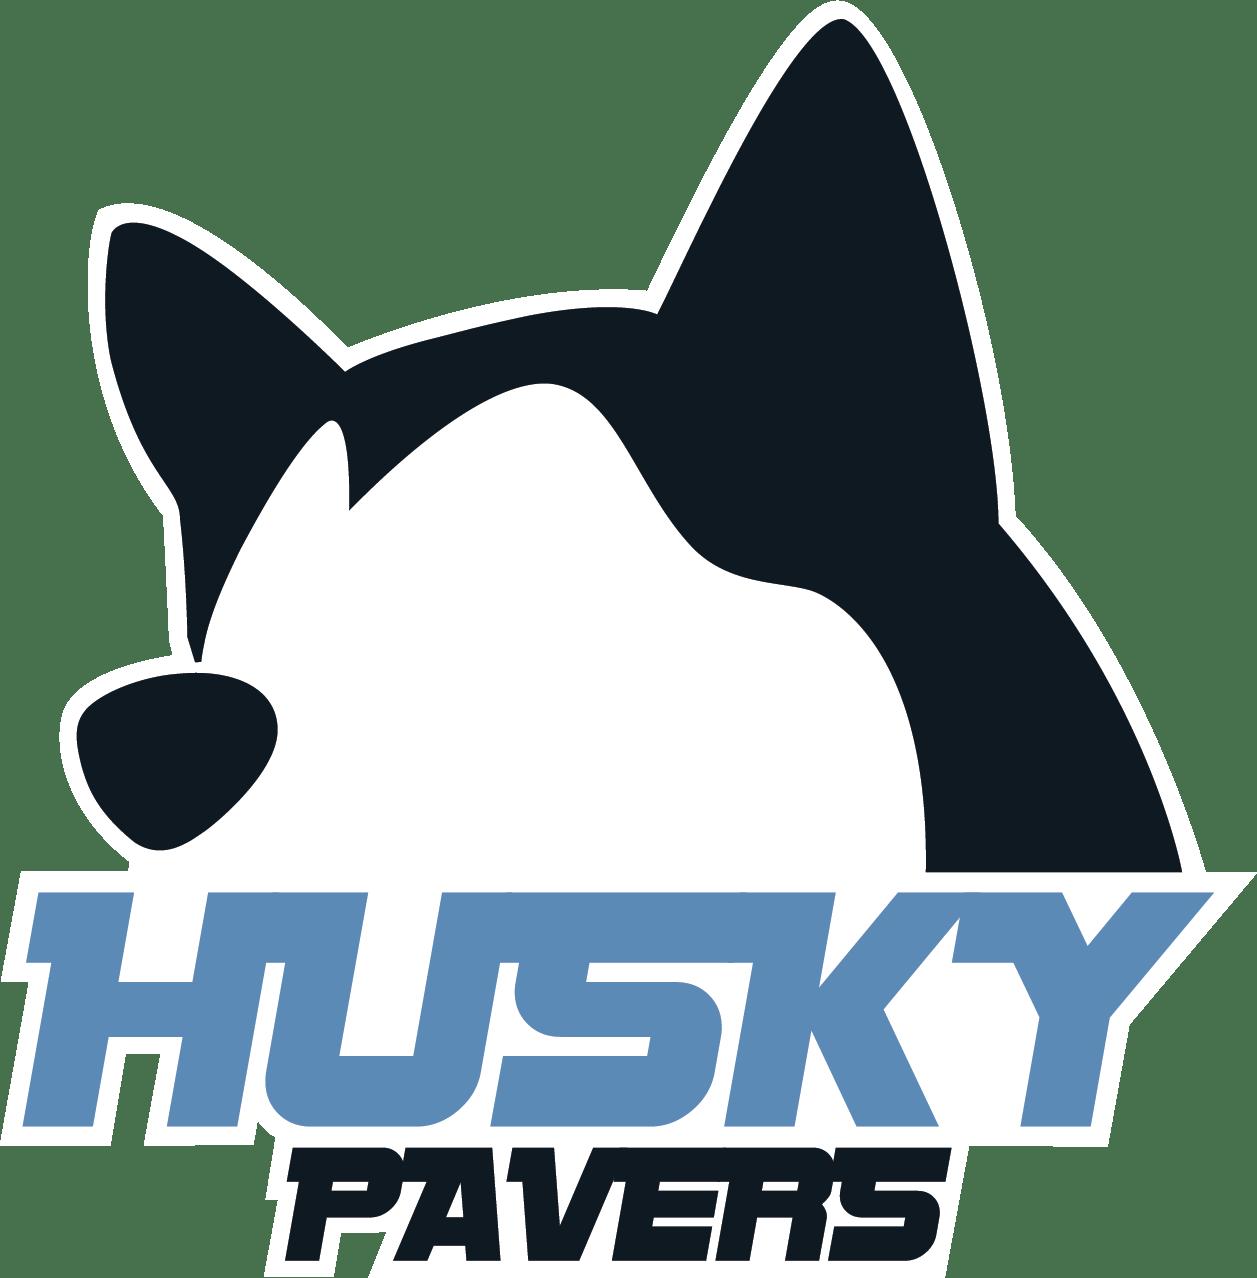 Huskey Pavers Logo